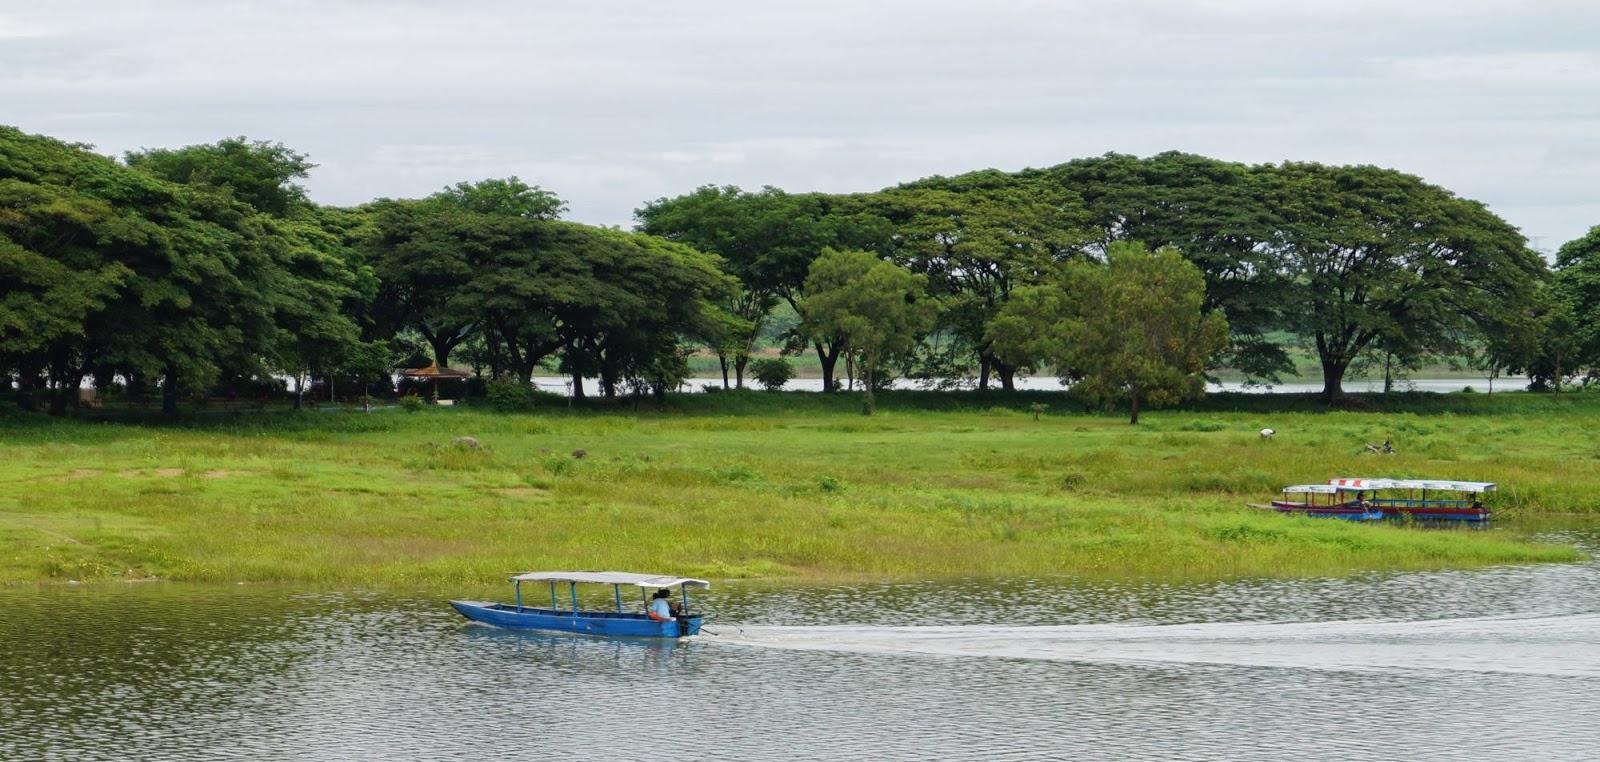 Wisata Madiun Waduk Bening Widas Indah Mempesona Bendungan Terletak Perbatasan